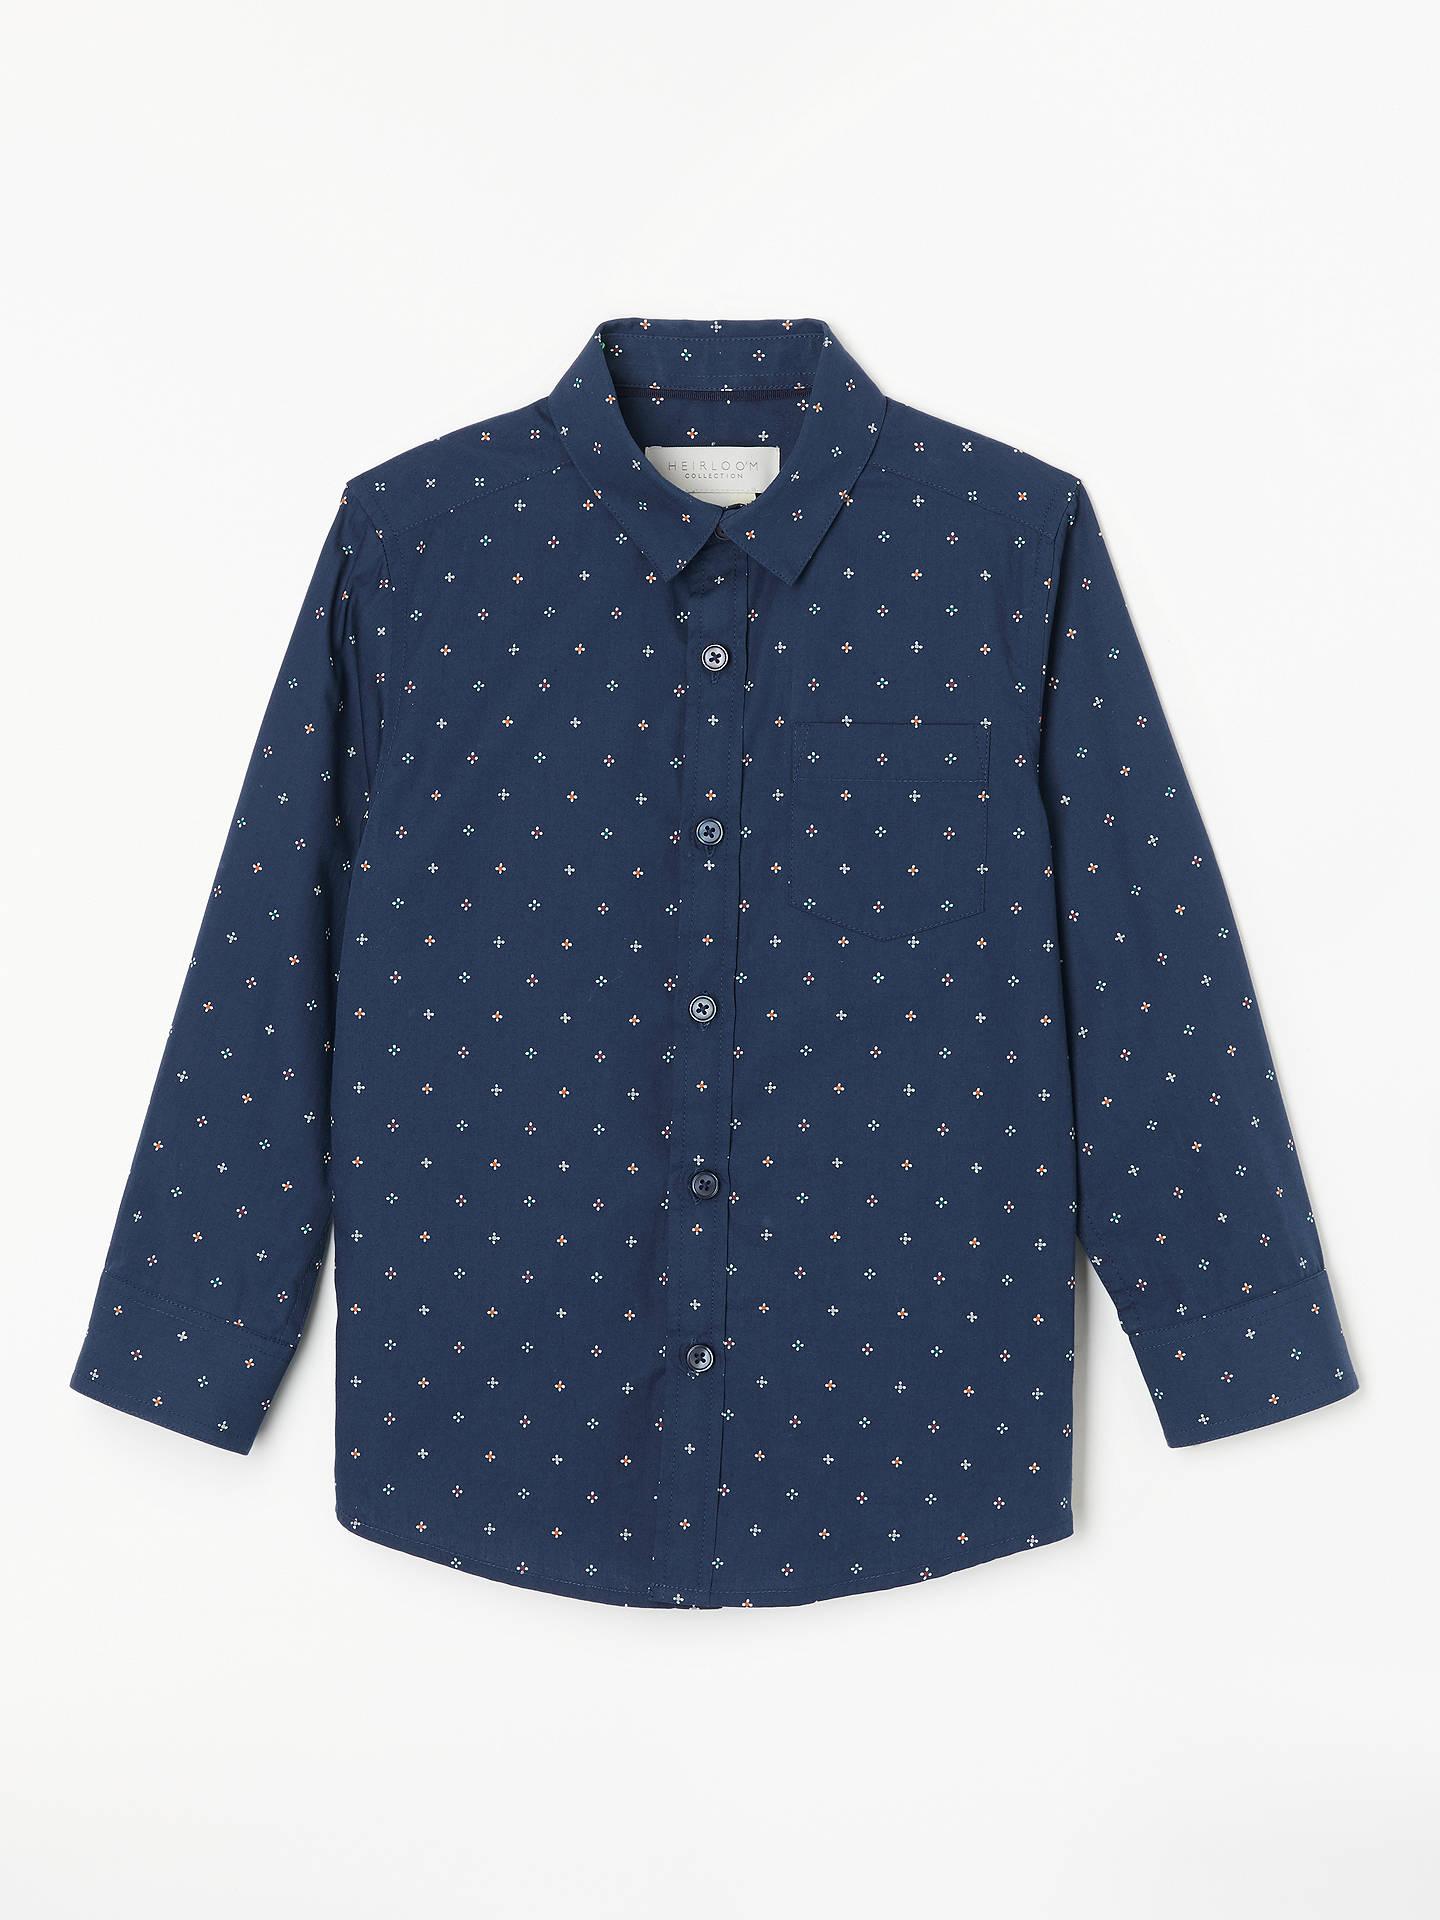 c68db70a1 Buy John Lewis & Partners Heirloom Collection Boys' Geo Print Shirt, Navy,  2 ...